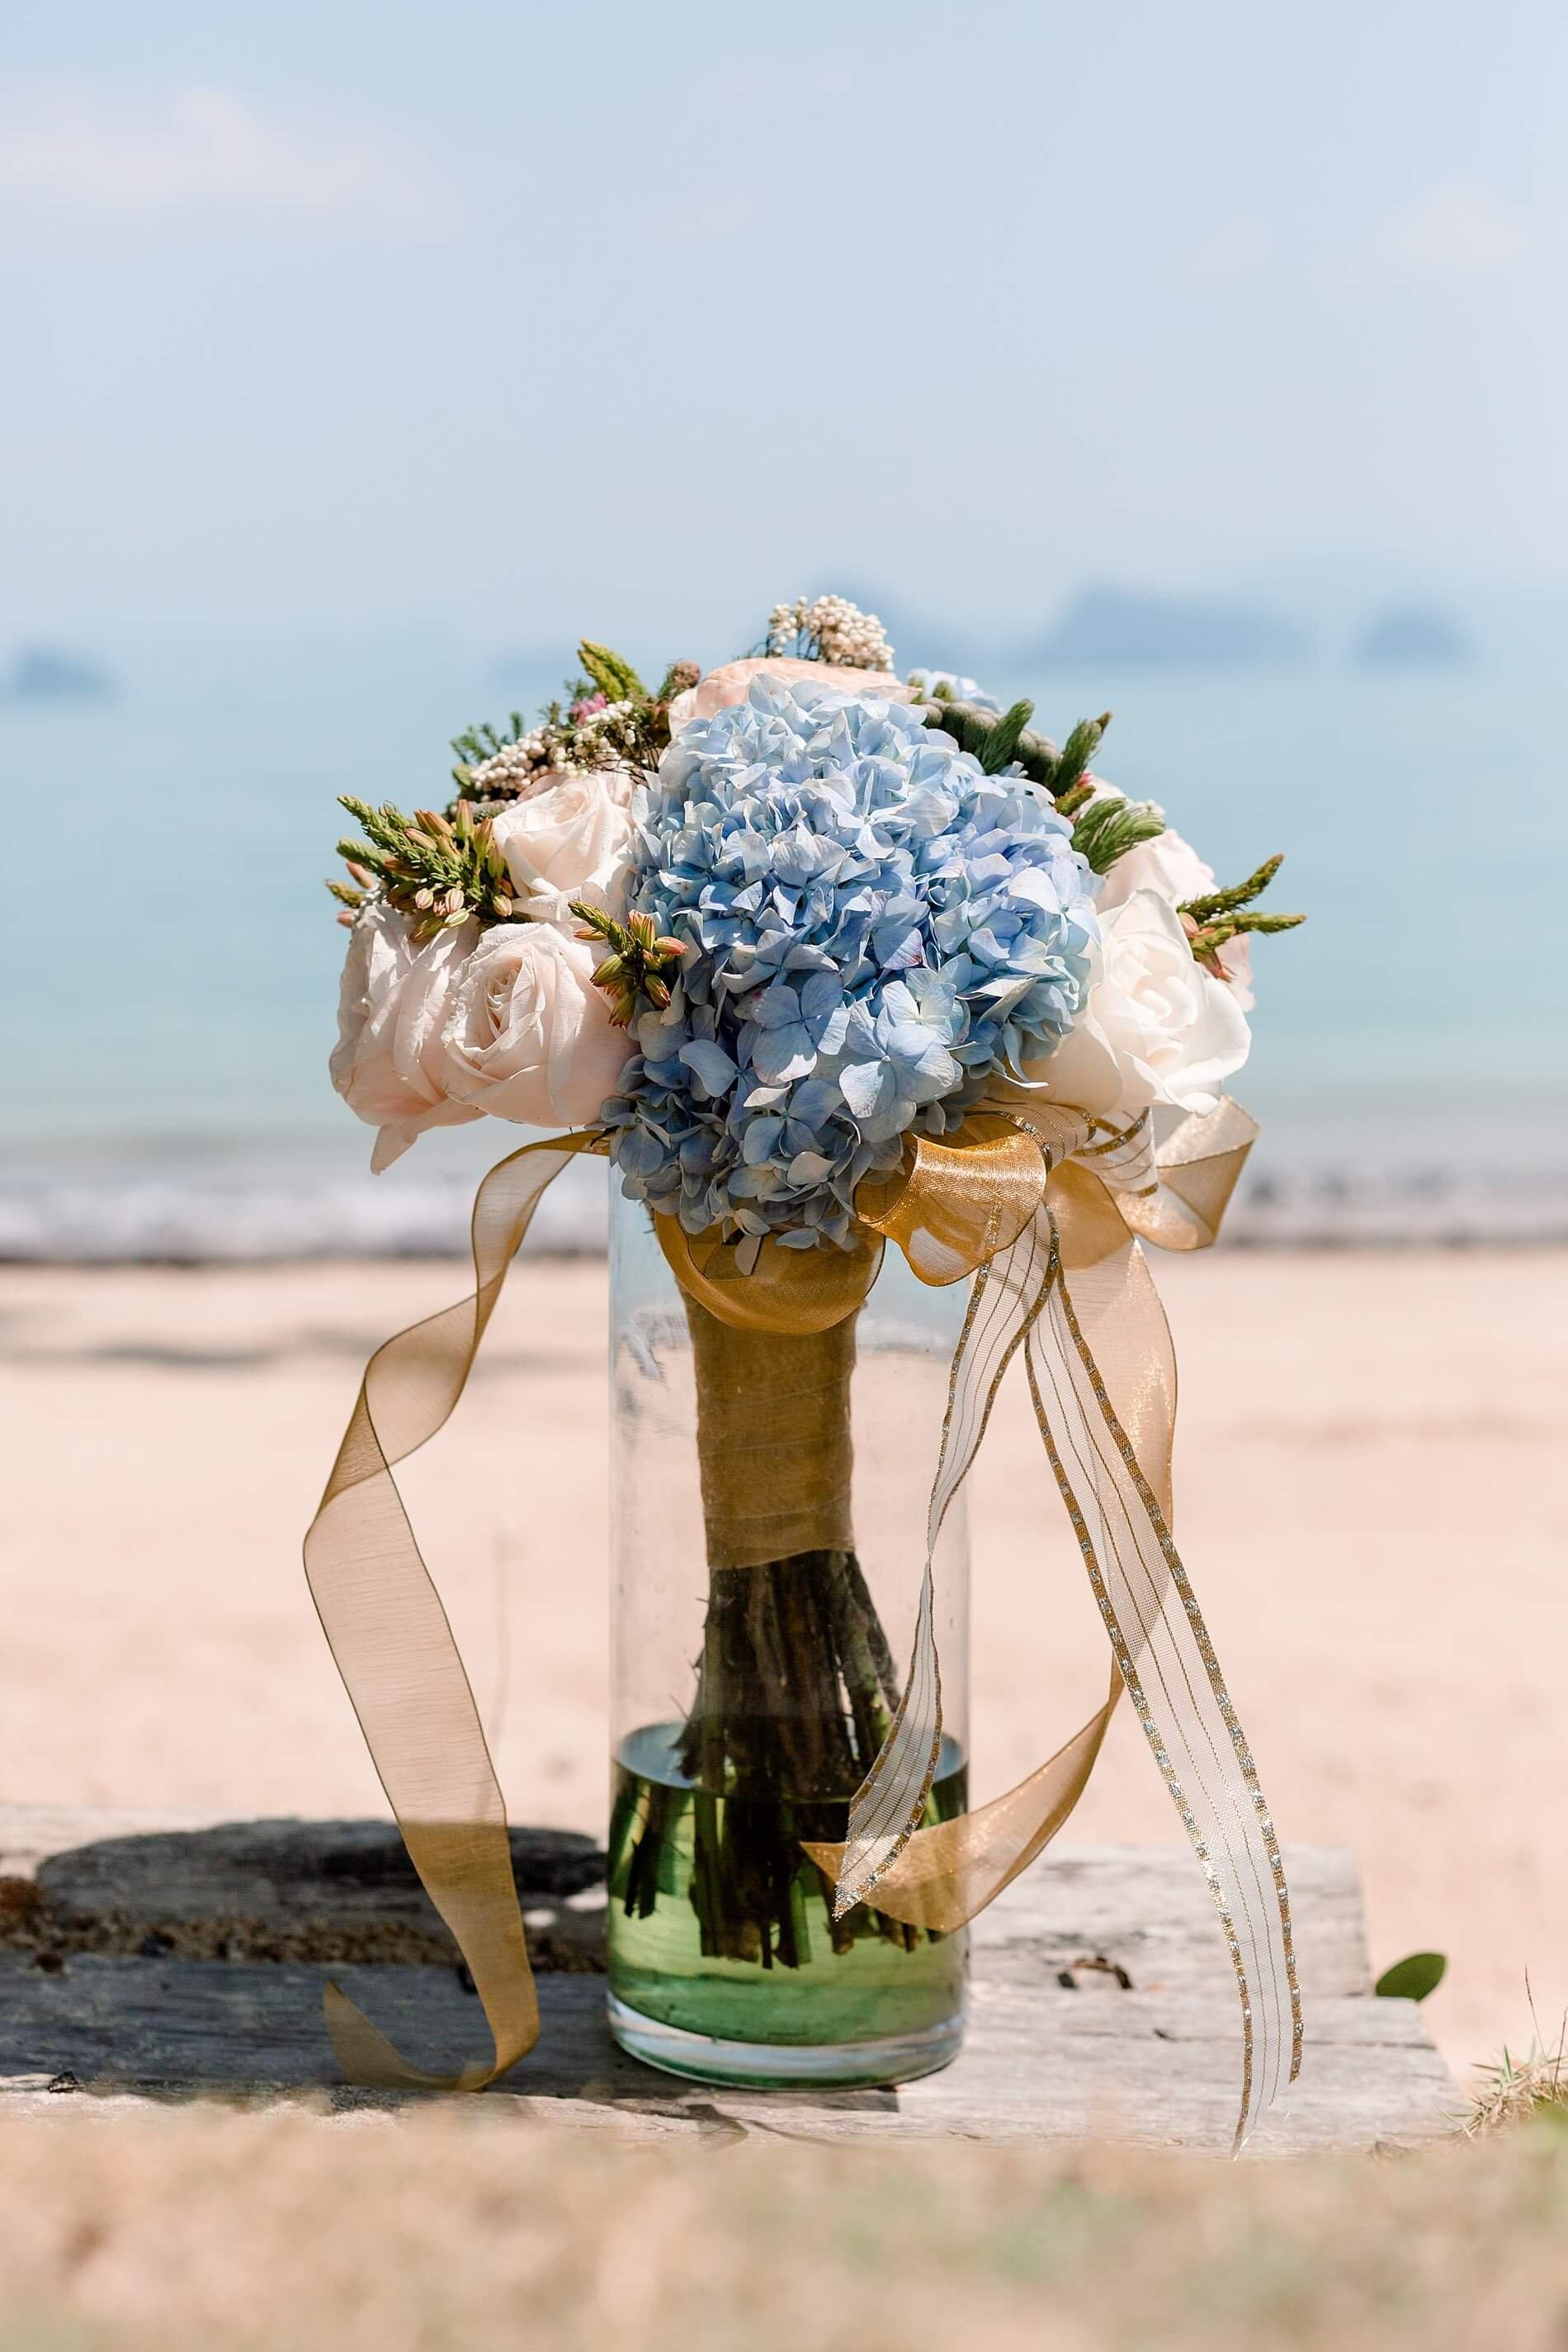 Gilles And Nicole Beach Wedding 25th Jan 2019 Laguna Villas Island 1